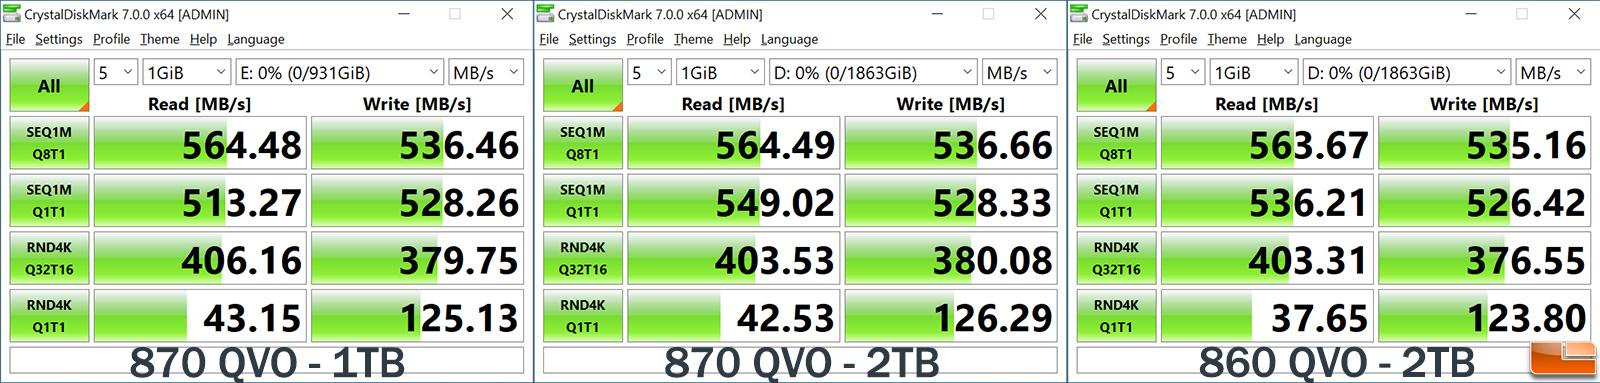 cdm-samsung-870qvo-1tb-2tb-ssd.jpg